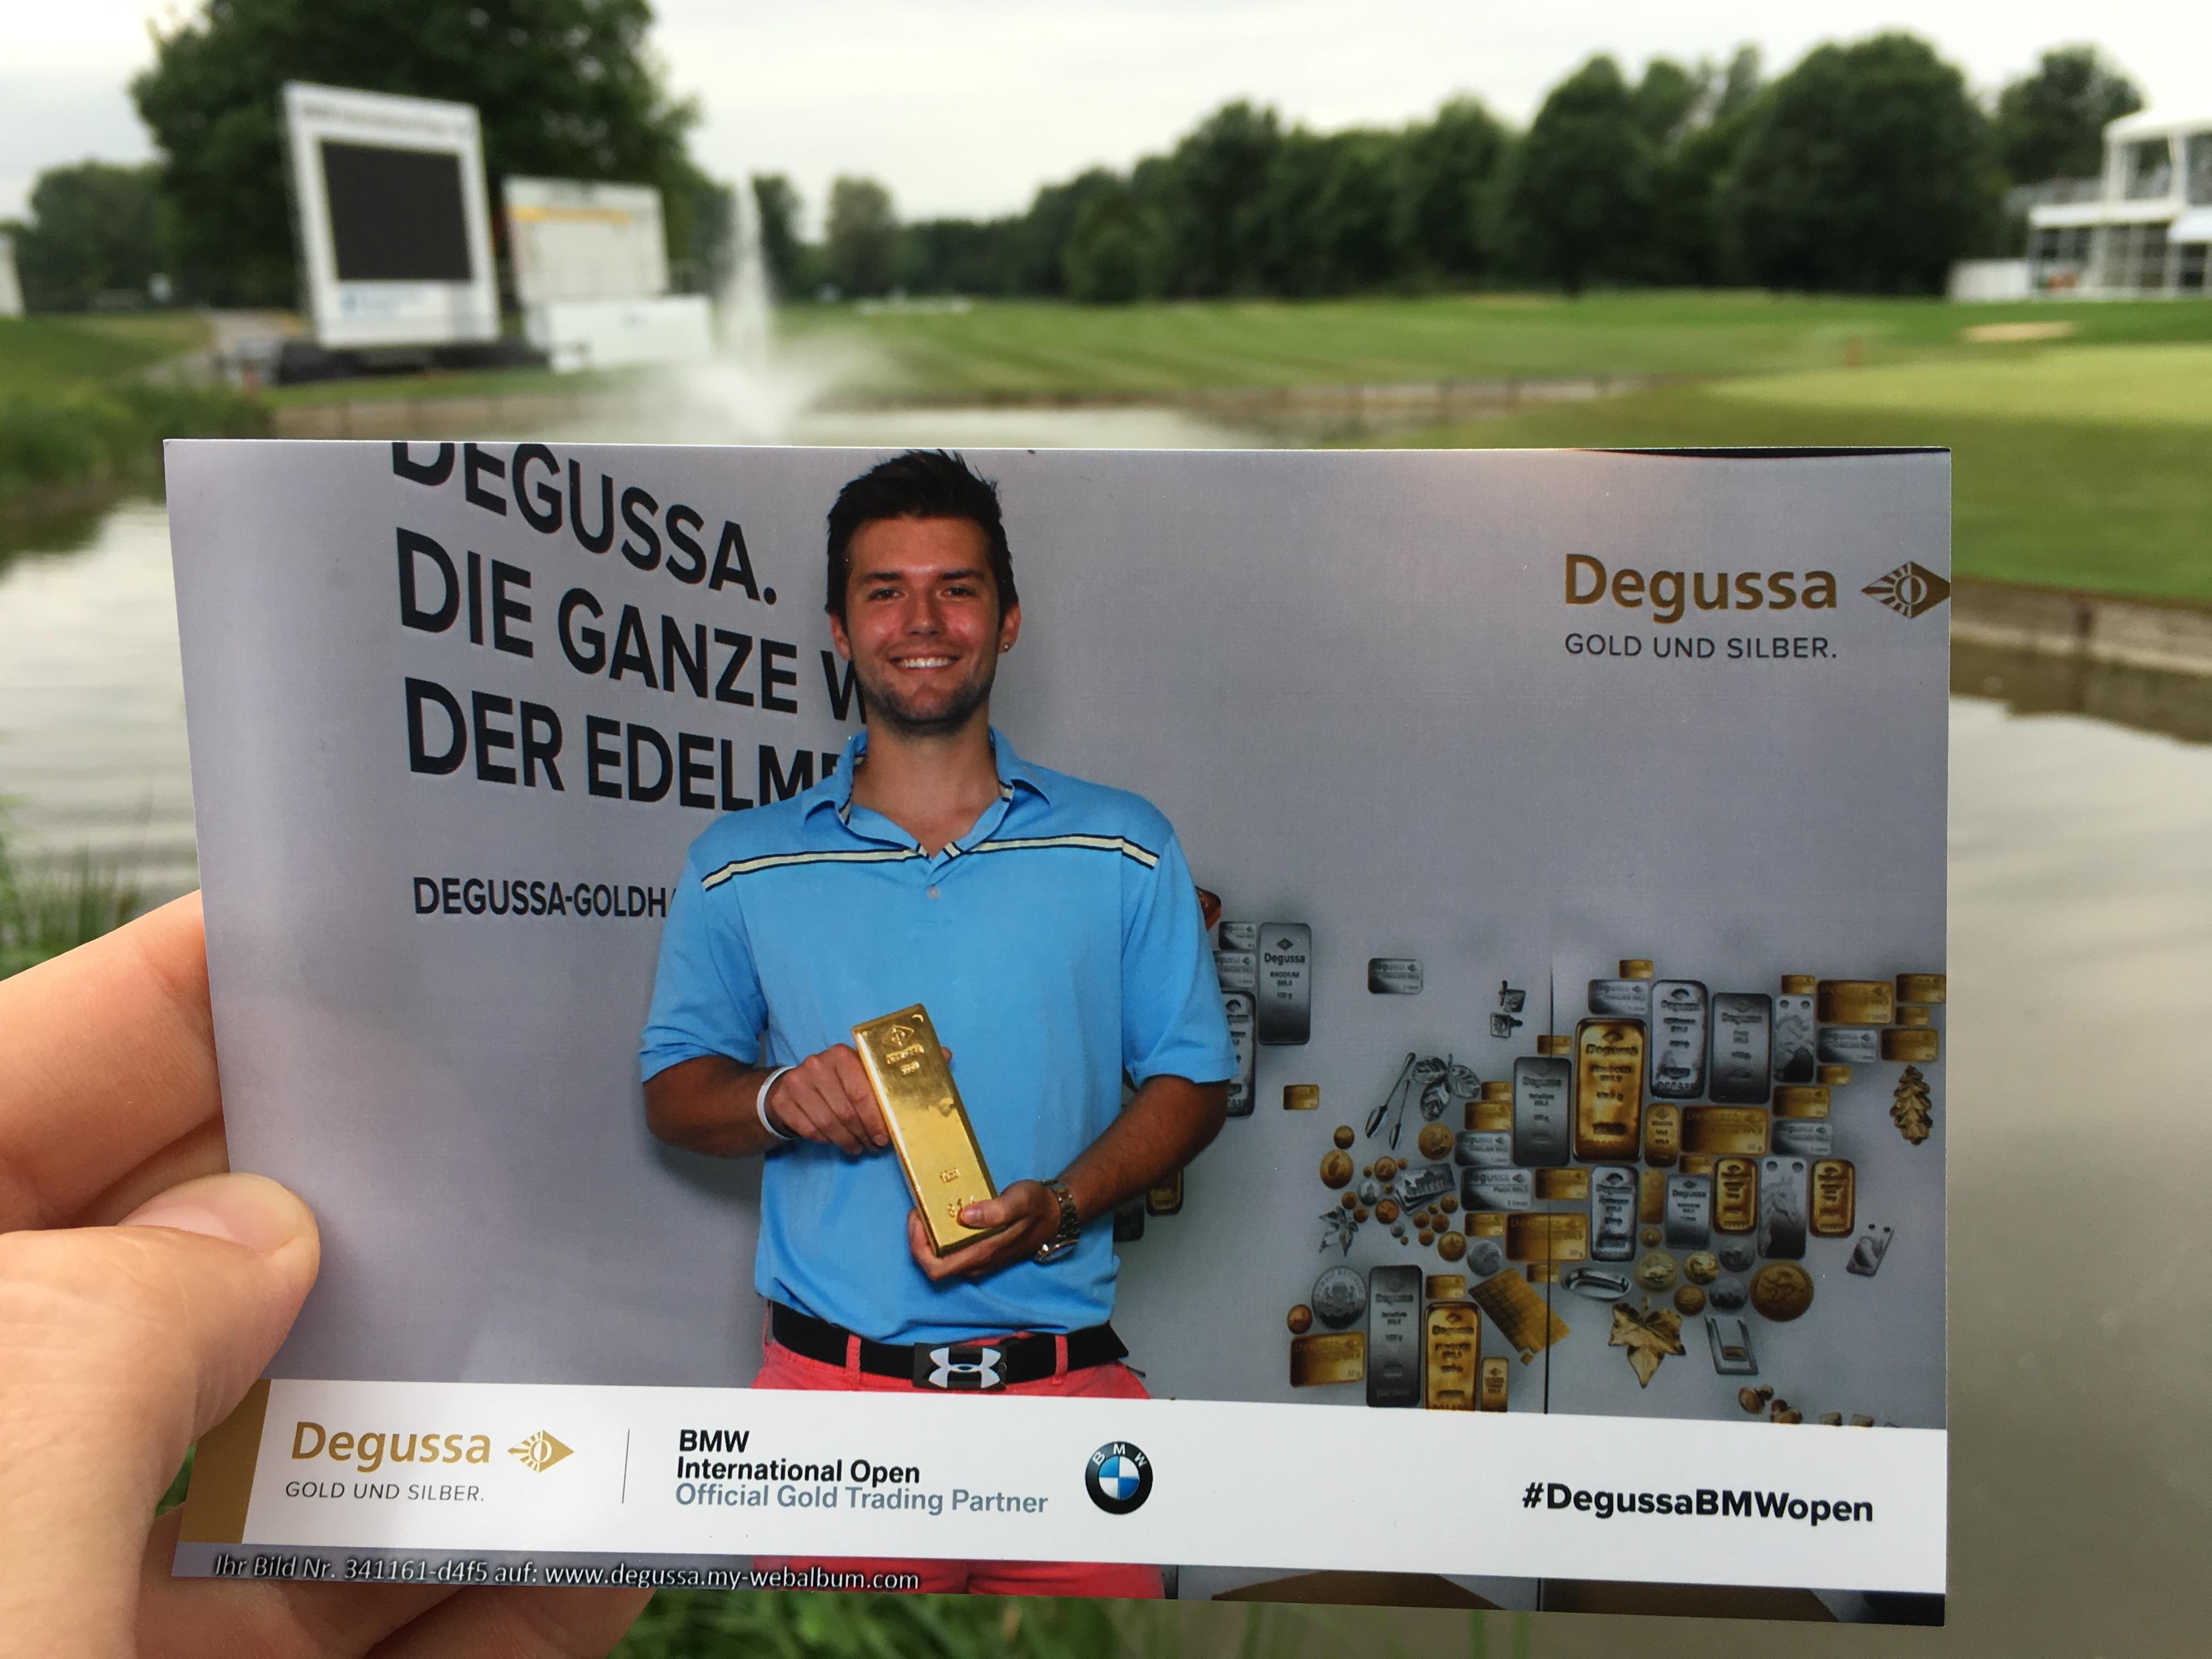 Avatar of golfer named Maximilian King